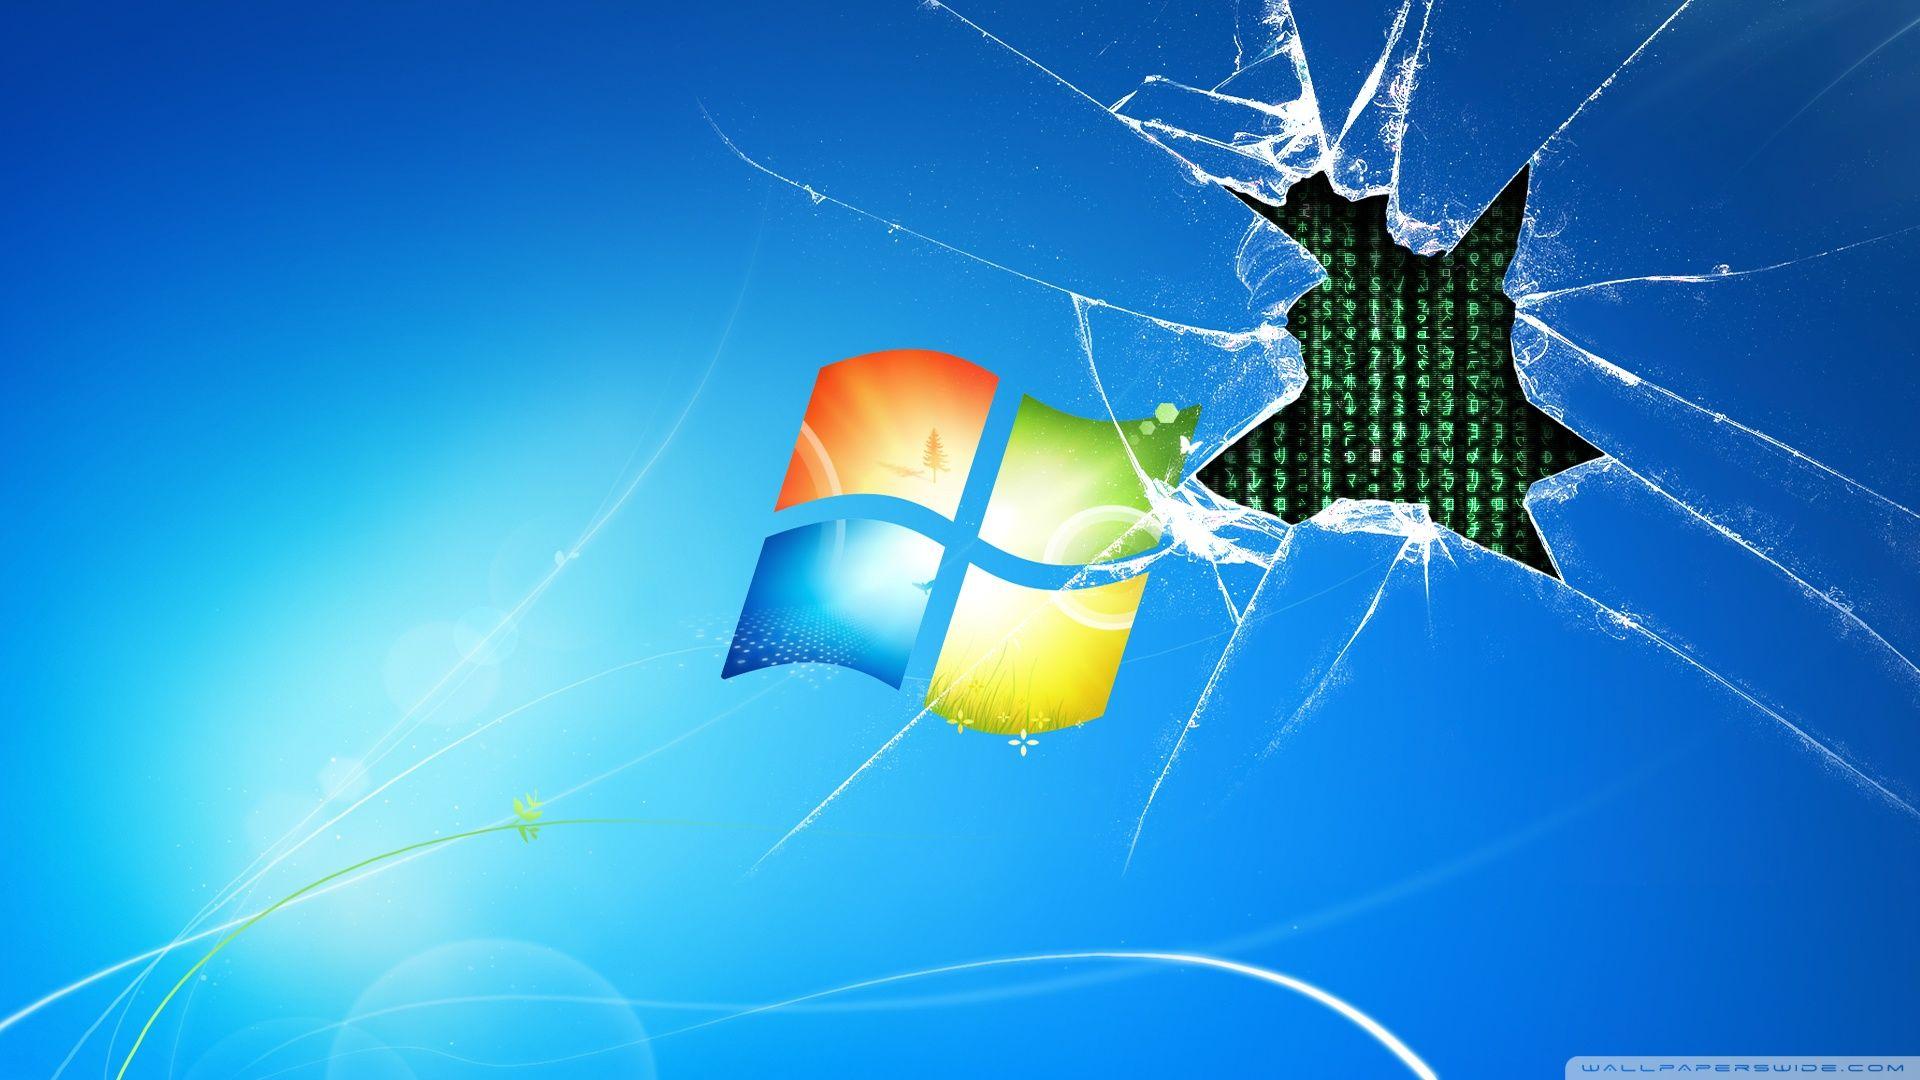 windows 7 runs on the matrix wallpaper reviews news tips